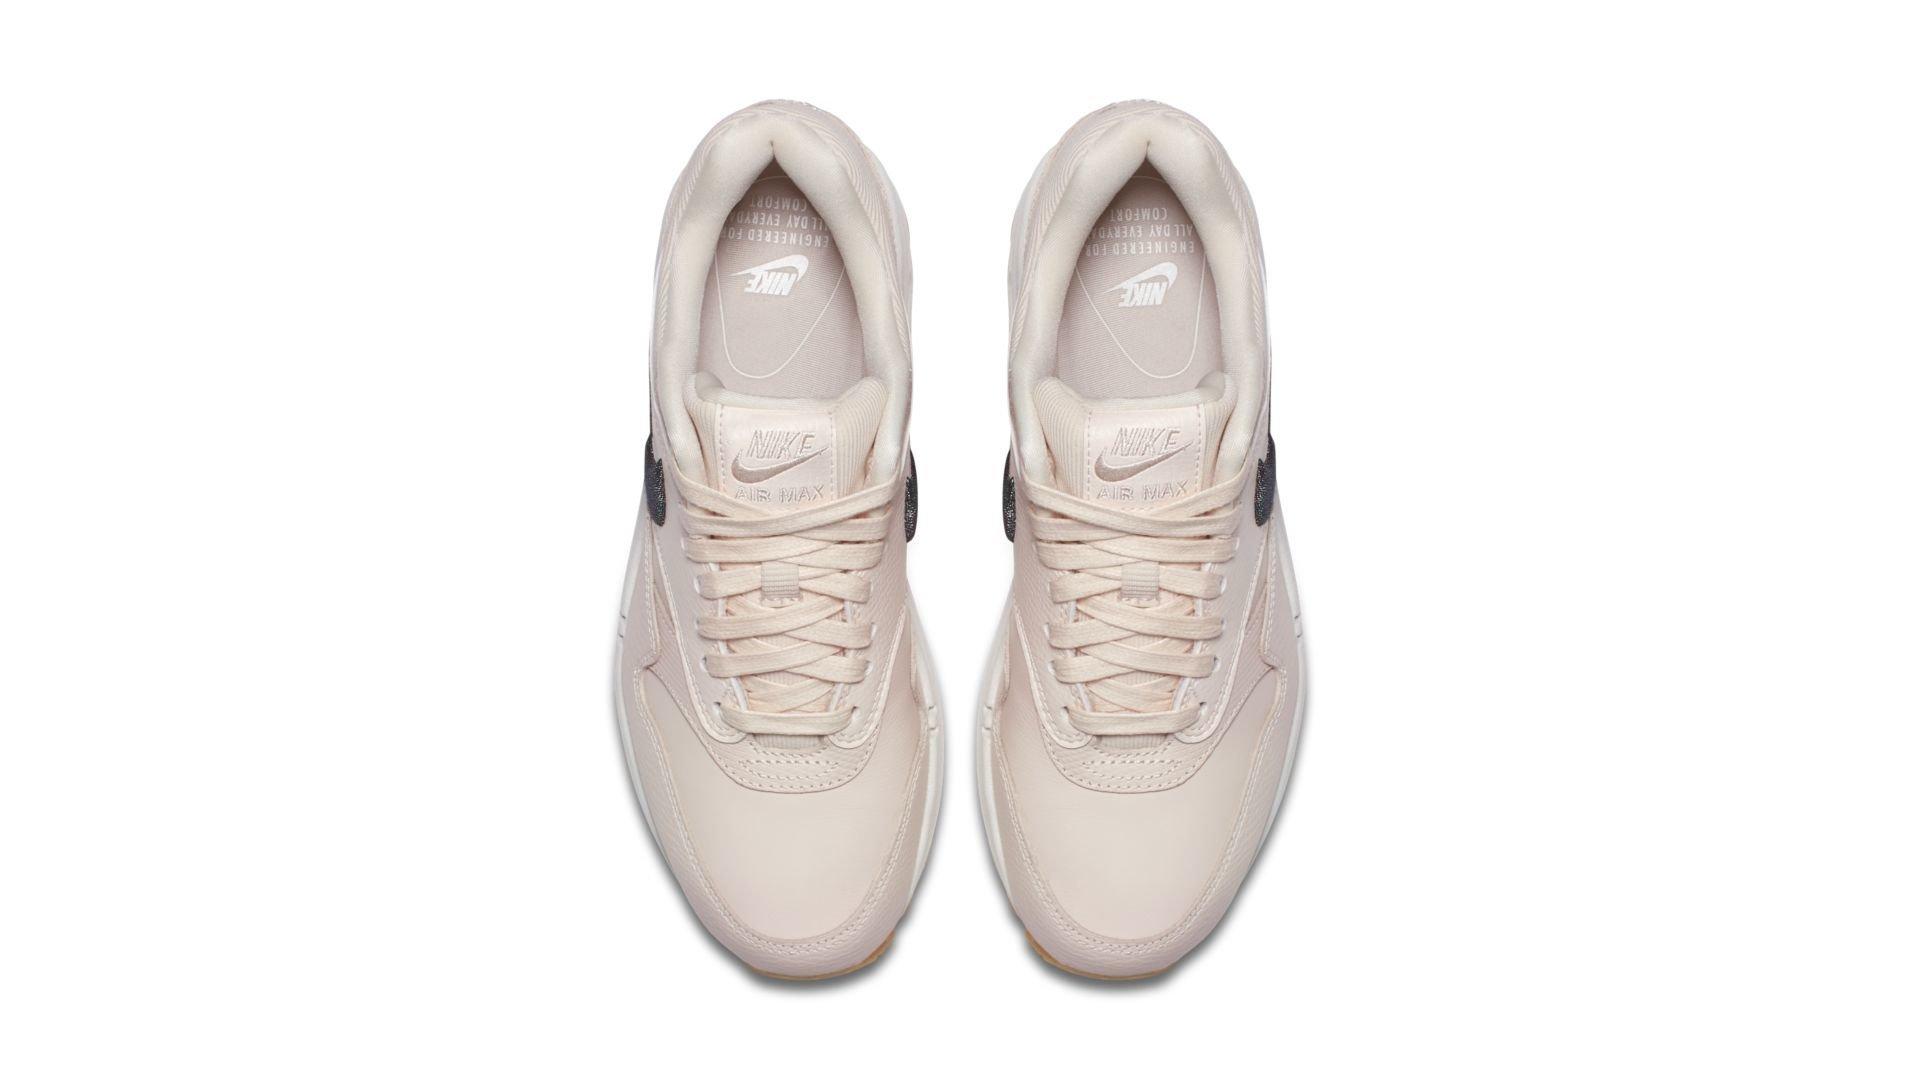 Nike Wmns Air Max 1 Premium 'Guava Ice' (454746-800)